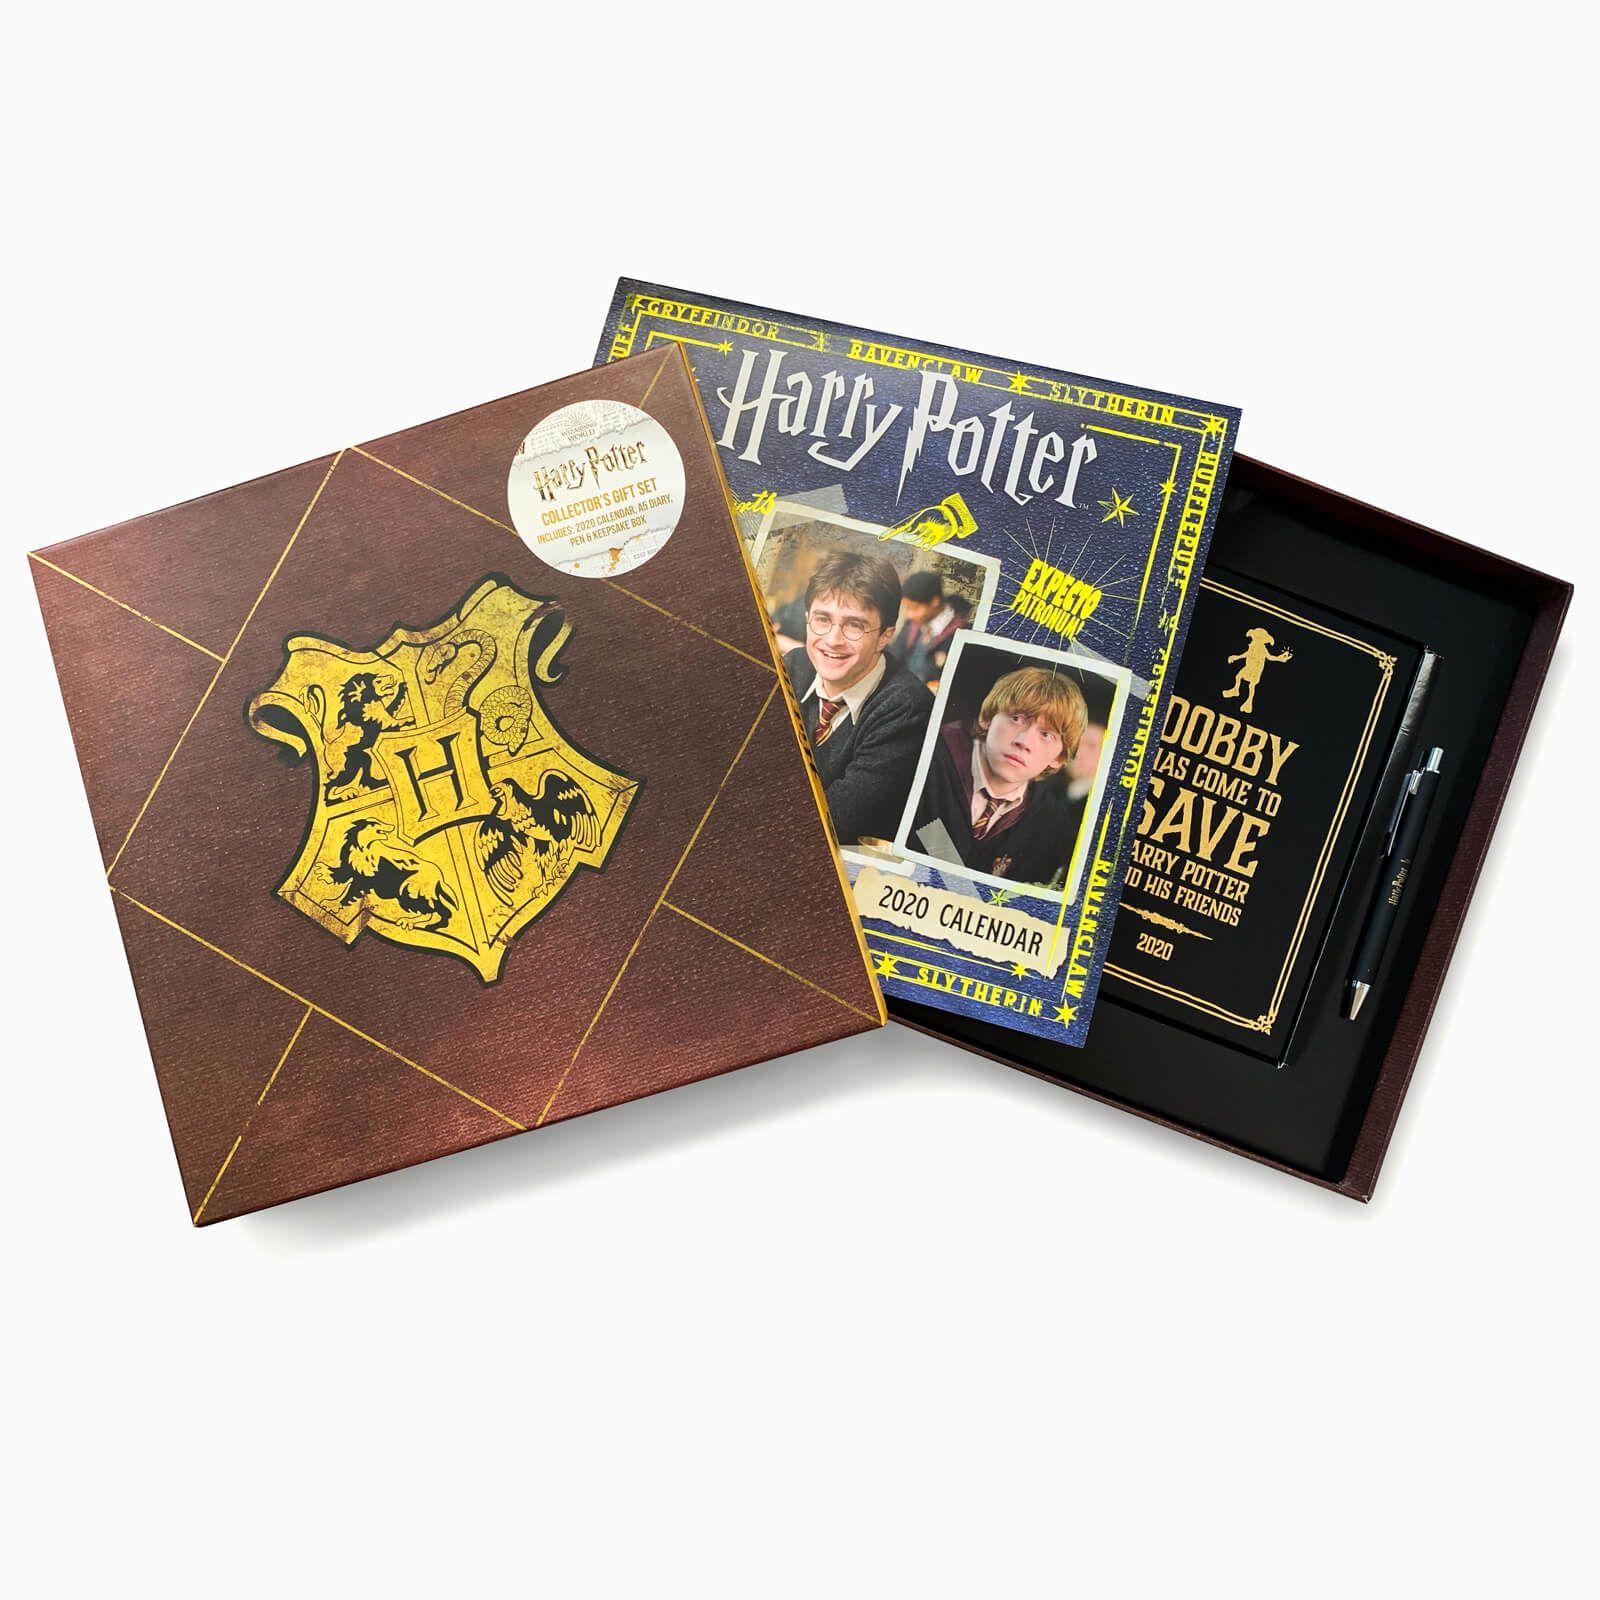 Harry Potter - zestaw na prezent długopis, kalendarz, pamiętnik 2020